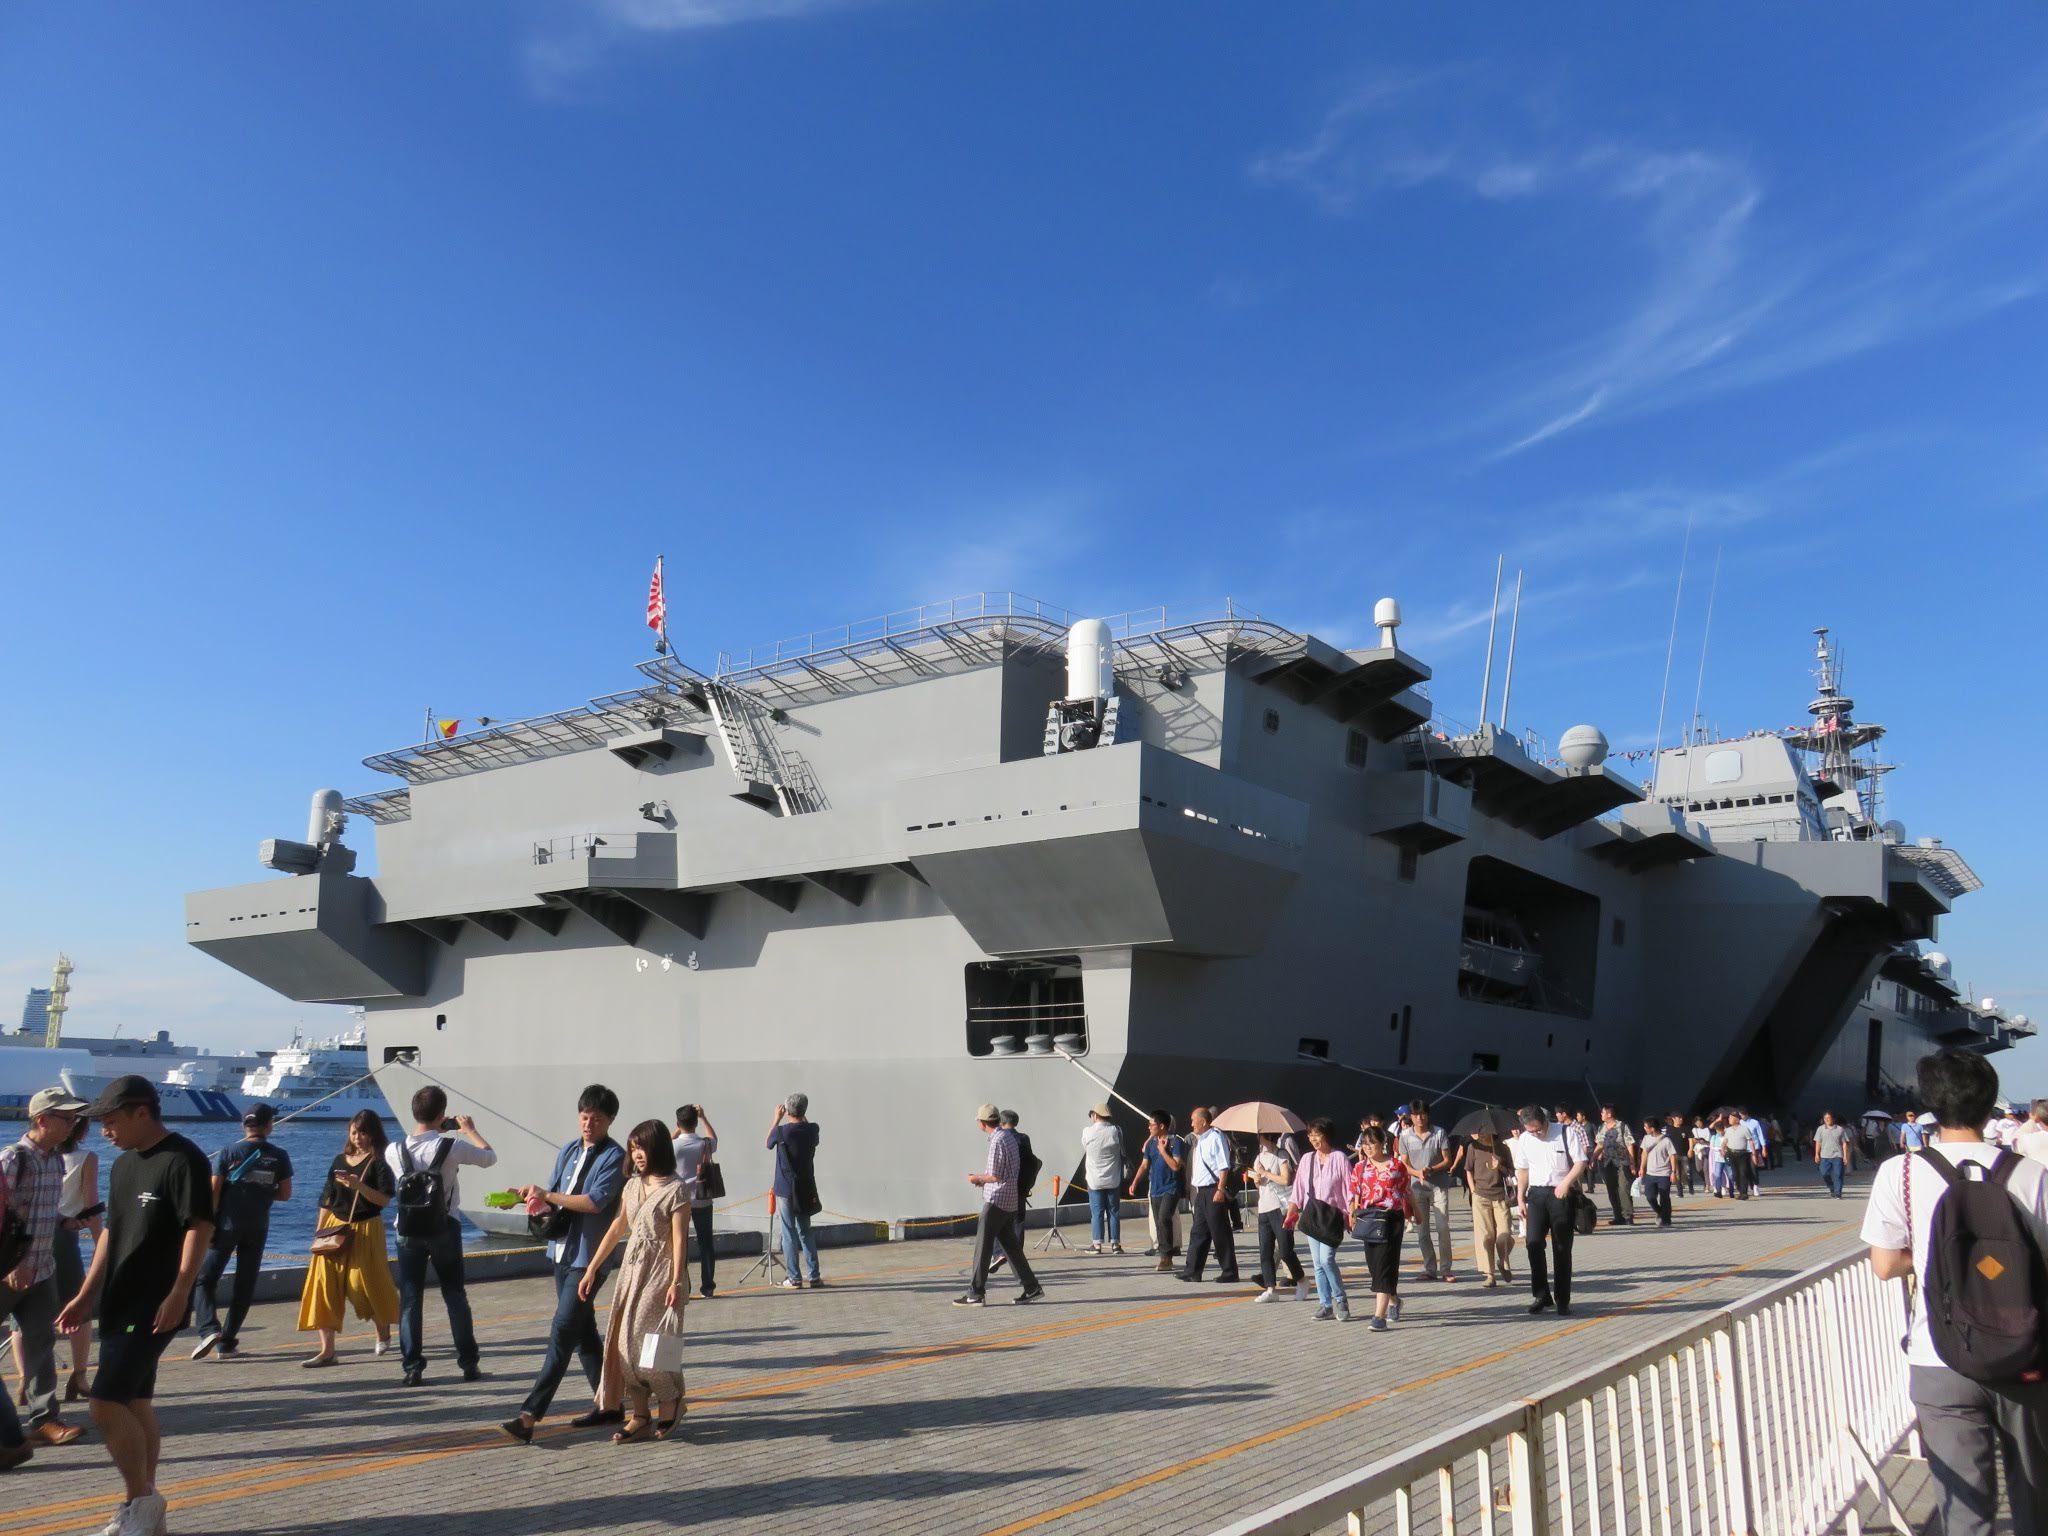 FLEETWEEK2019横浜 - 護衛艦「いずも」一般公開_a0057402_21261321.jpg